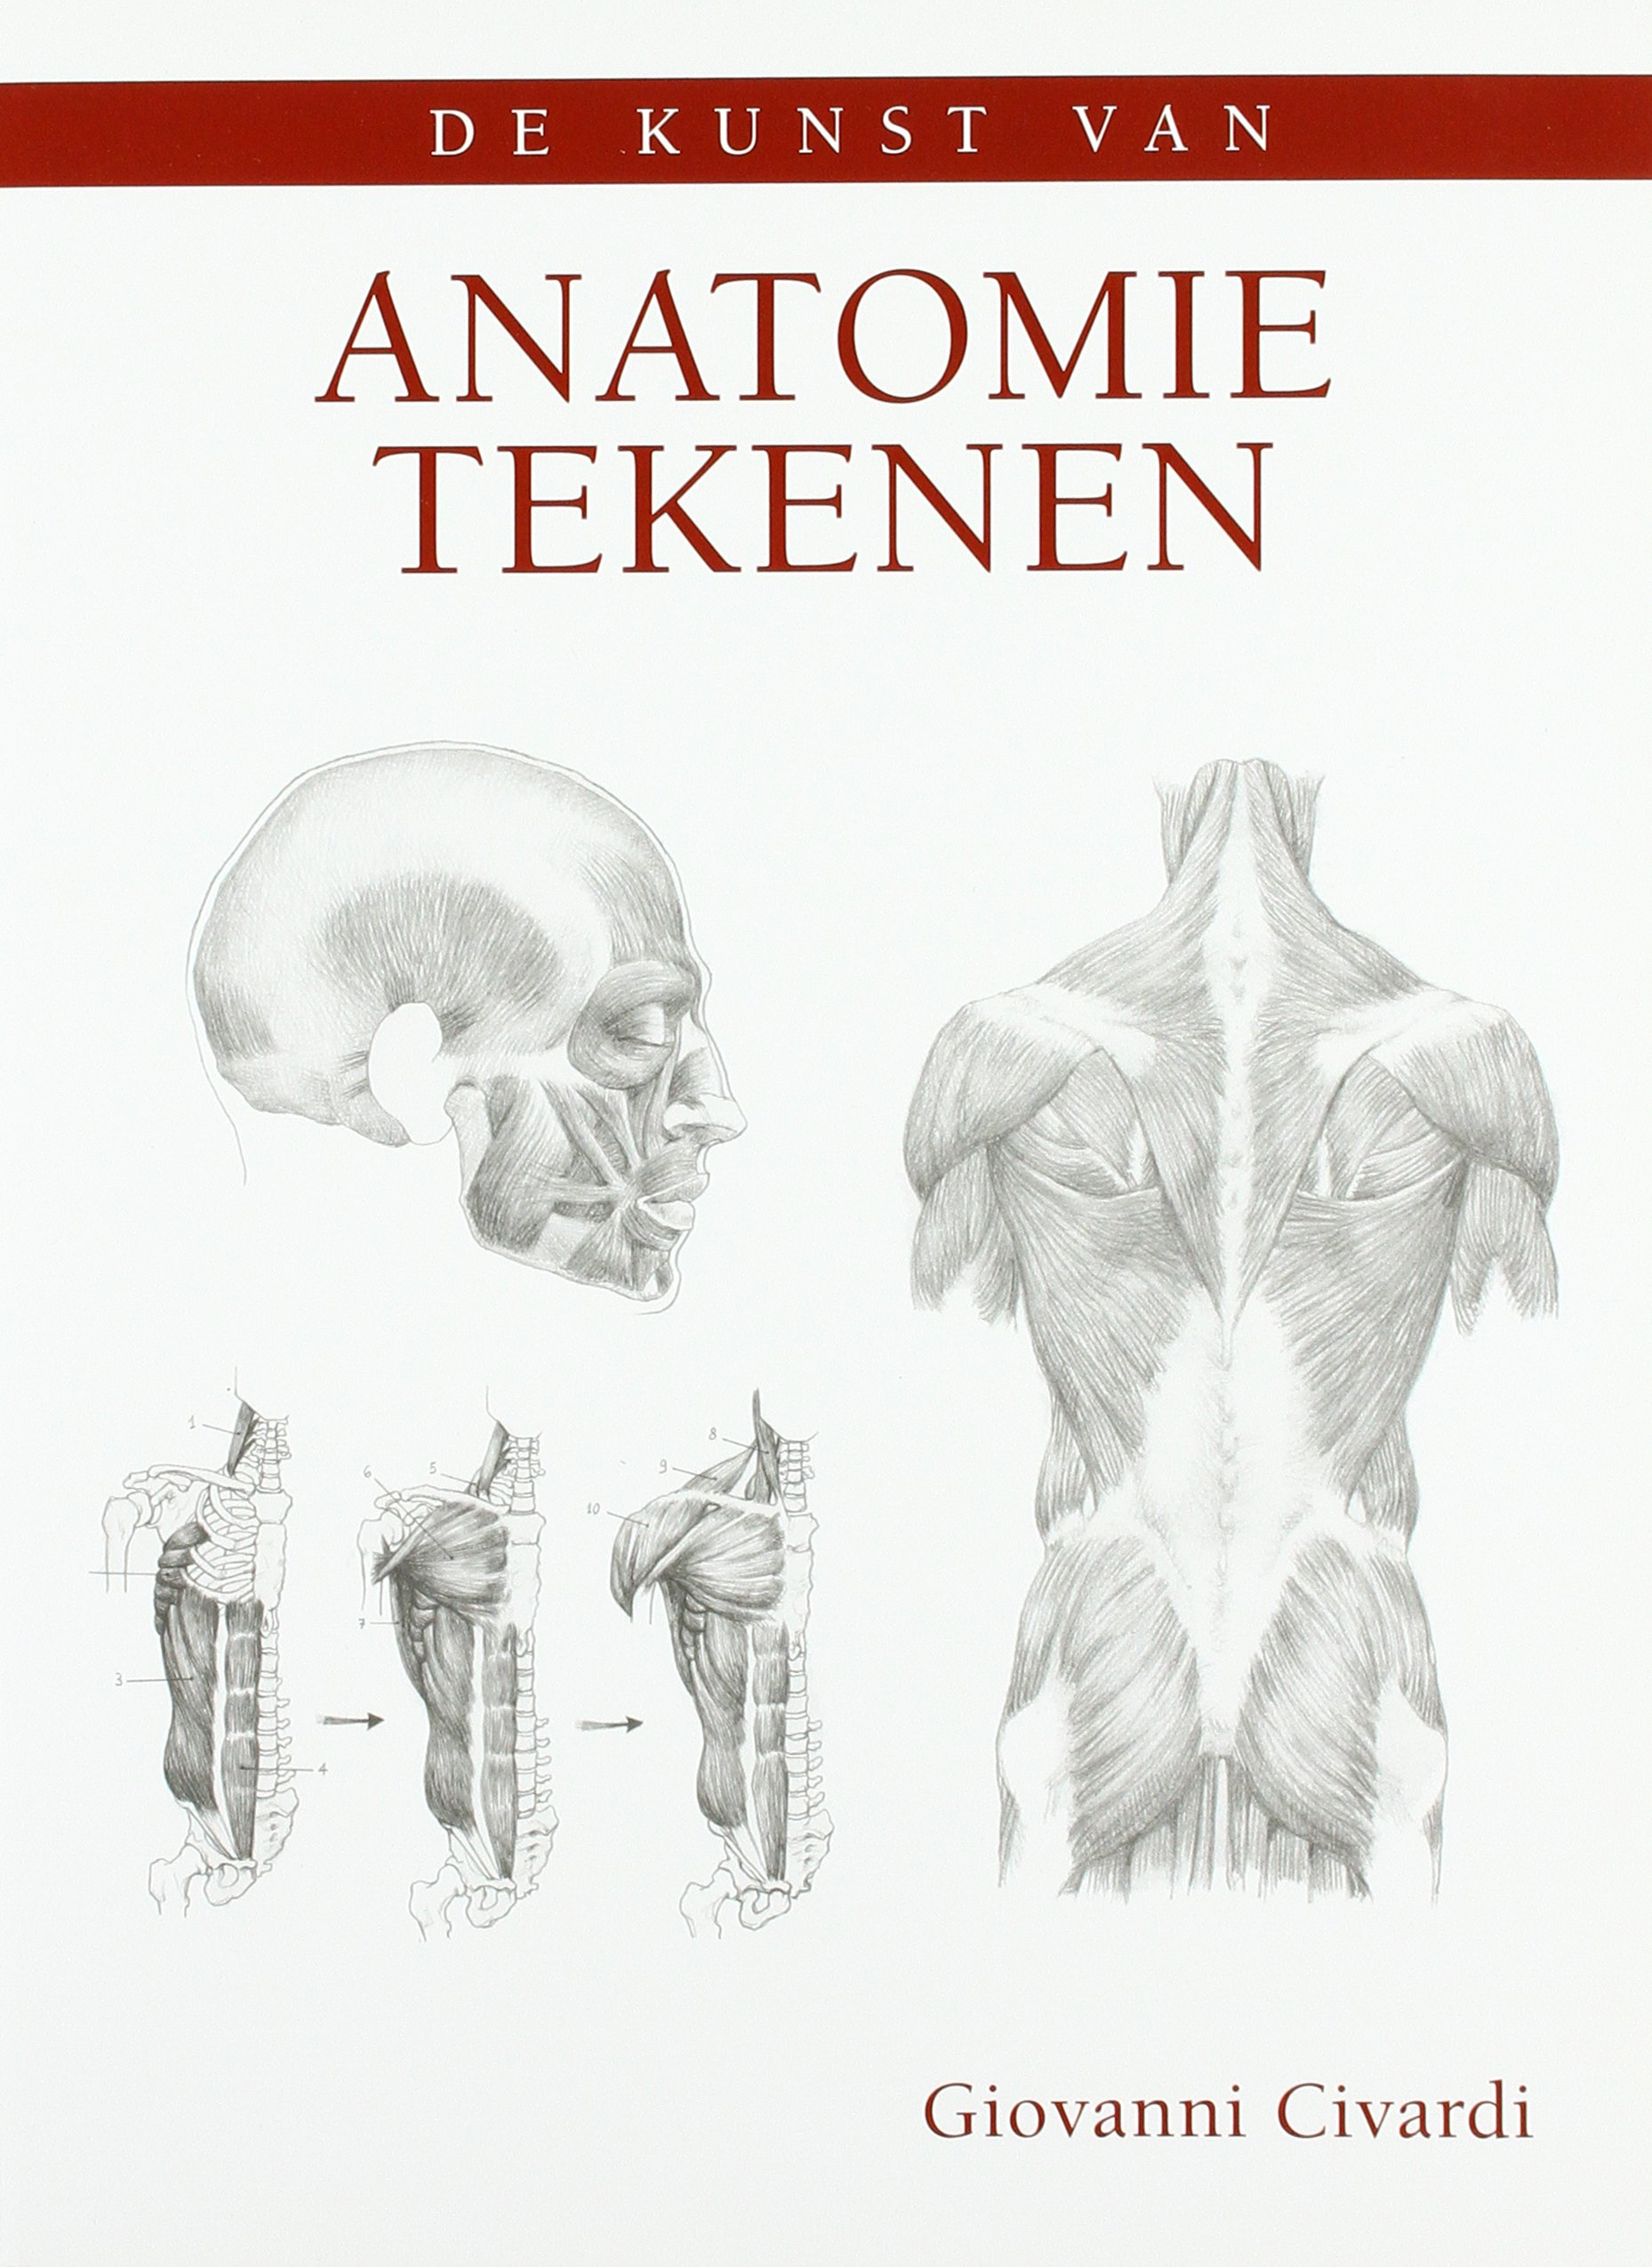 De kunst van anatomie tekenen: Amazon.es: Giovanni Civardi ...